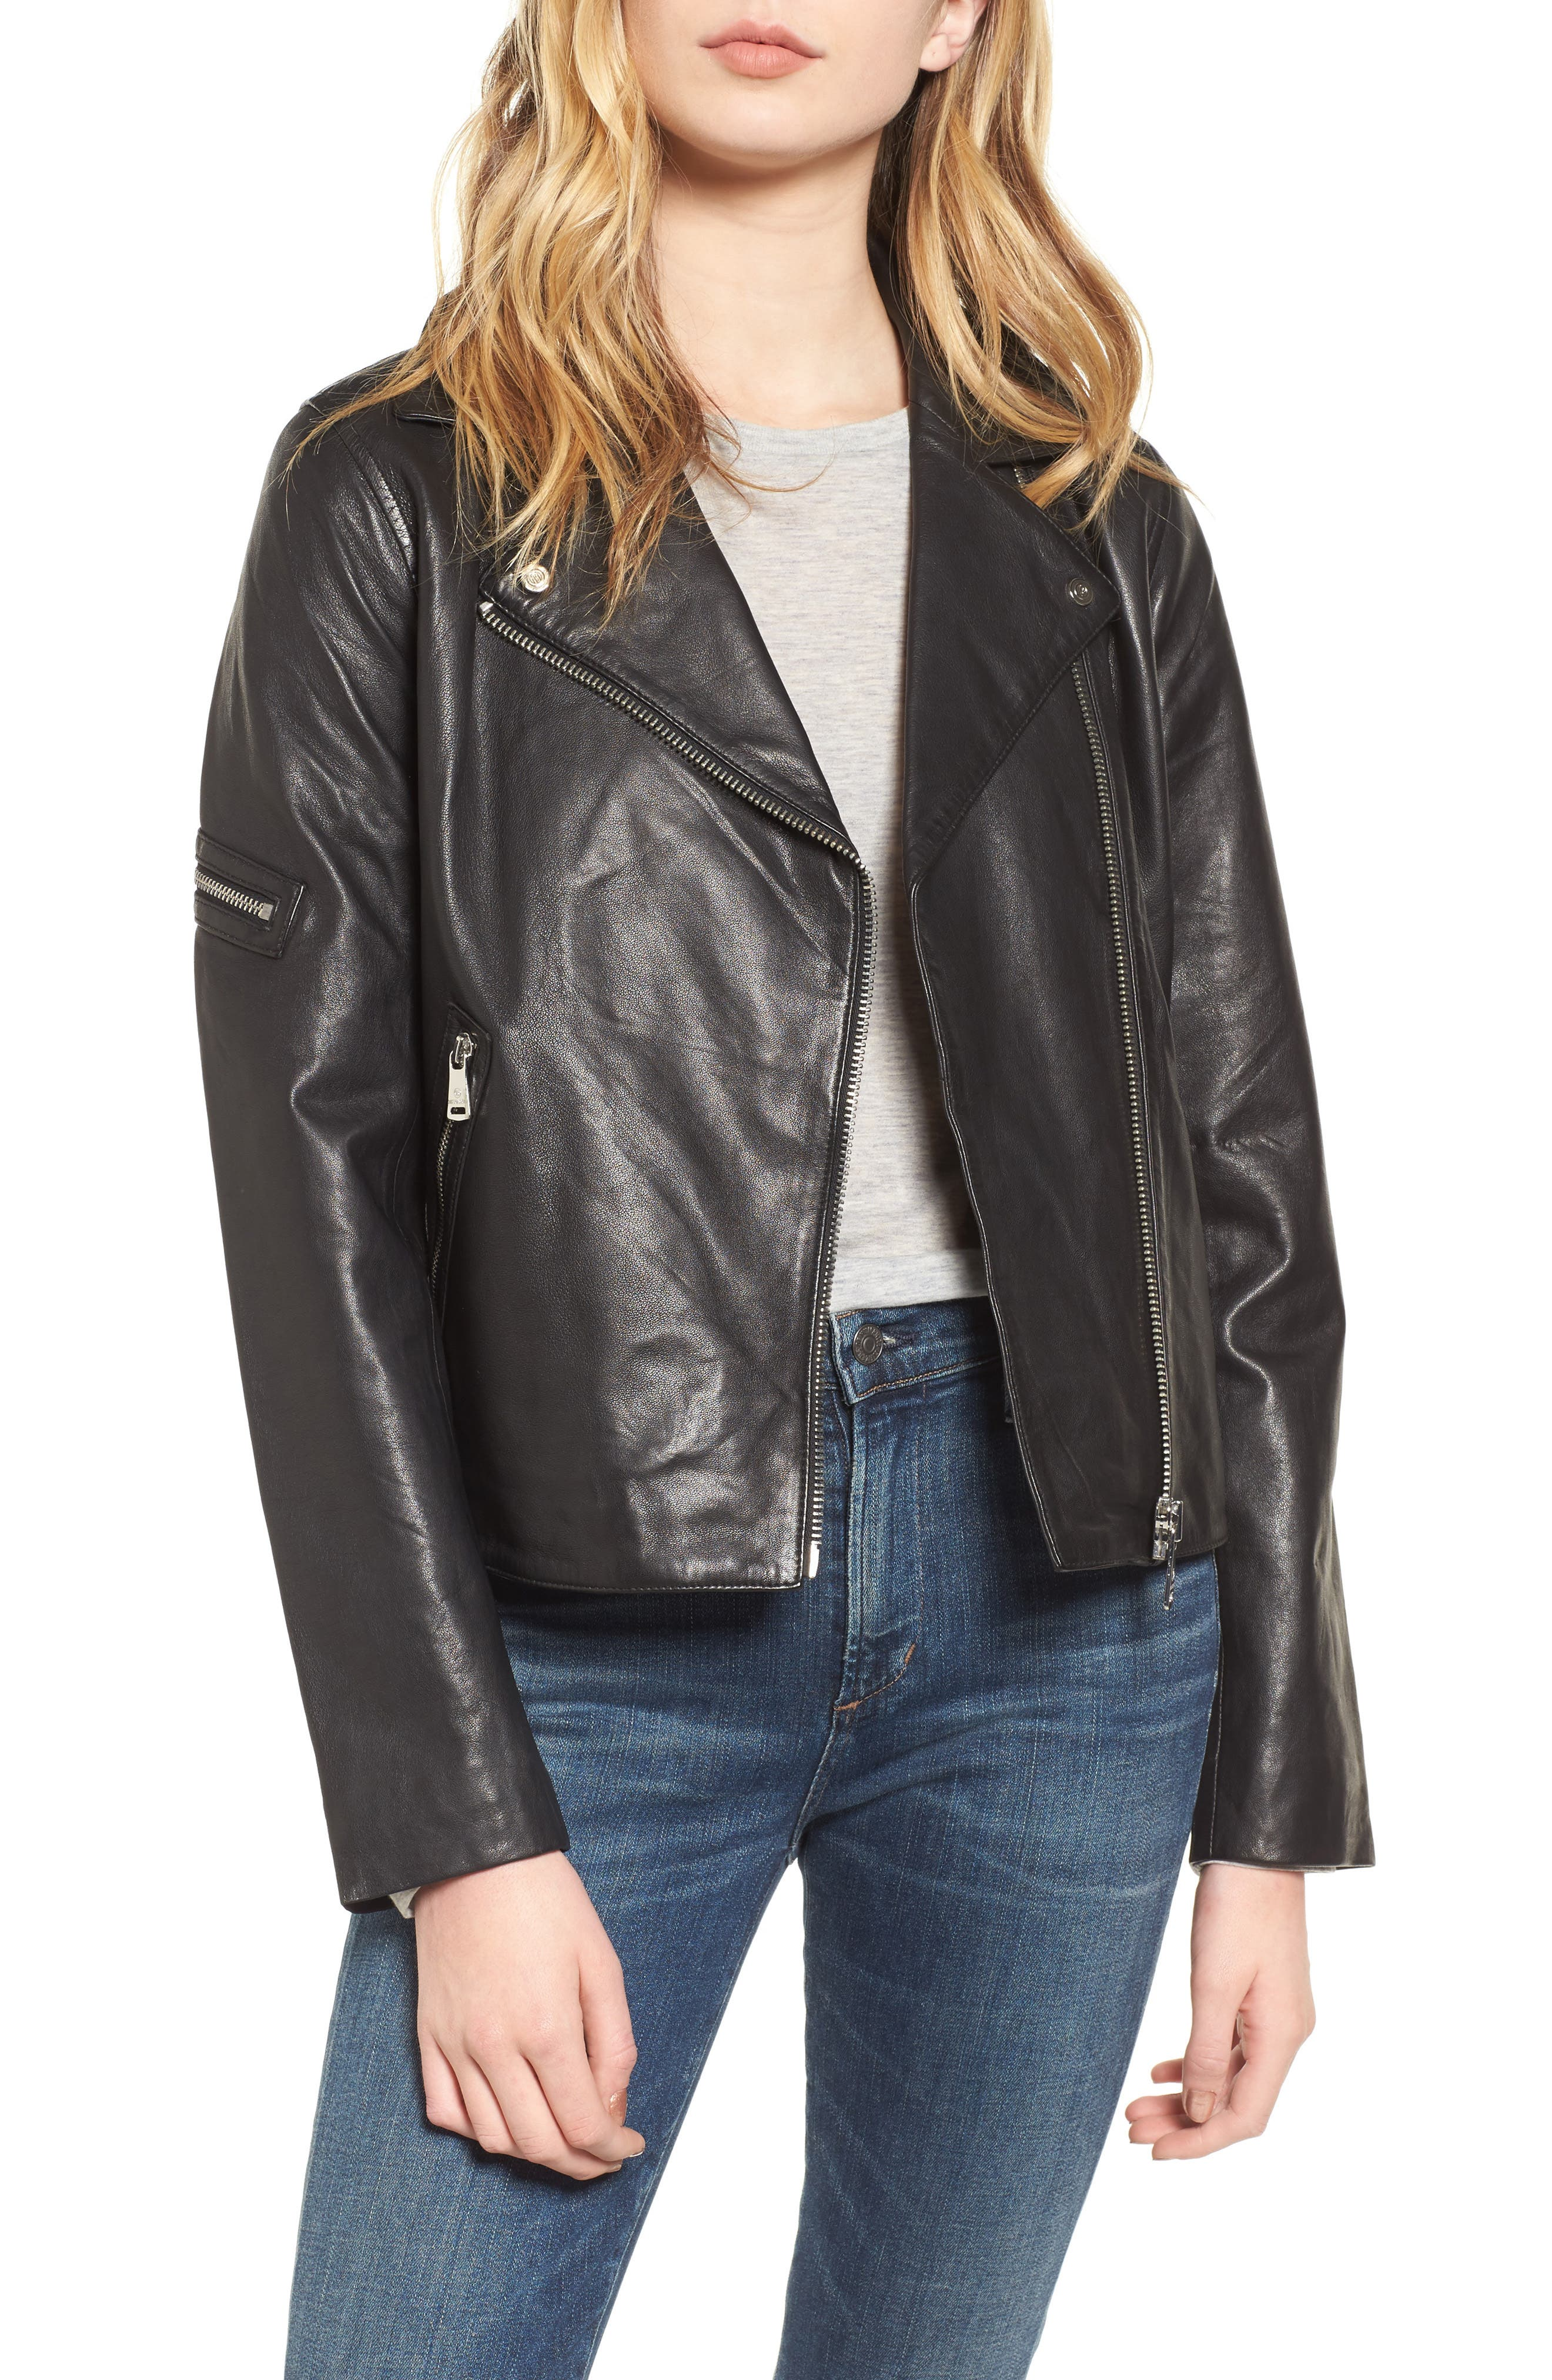 Kirwin Leather Moto Jacket,                             Main thumbnail 1, color,                             001